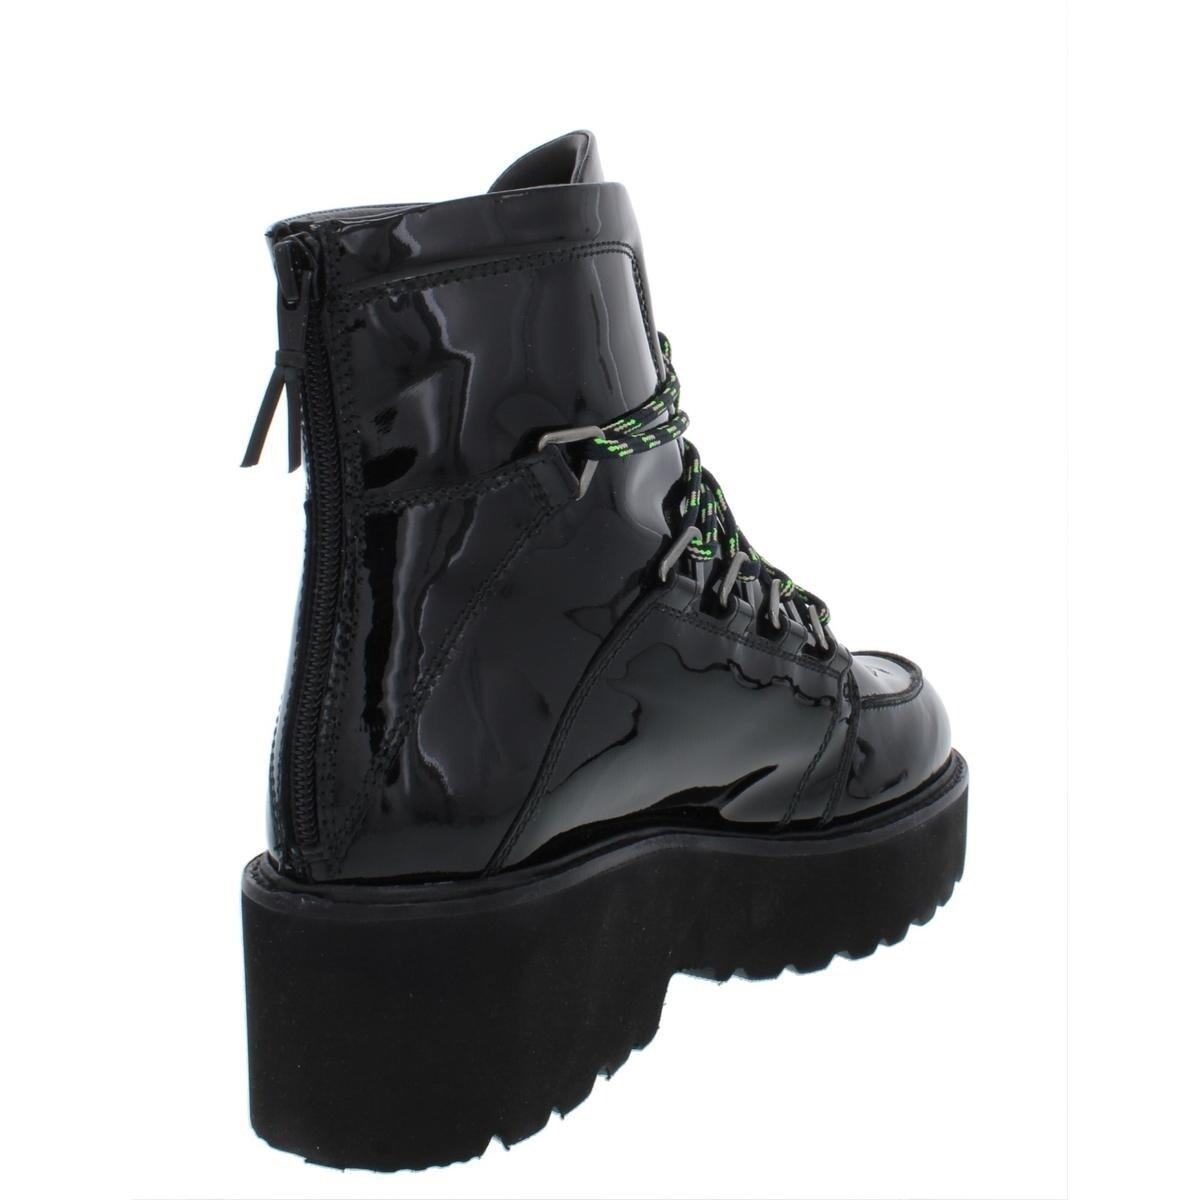 b52a0589636 Shop Stuart Weitzman Womens Belowdeck Platform Boots Patent Leather Hiking  - 8.5 Medium (B